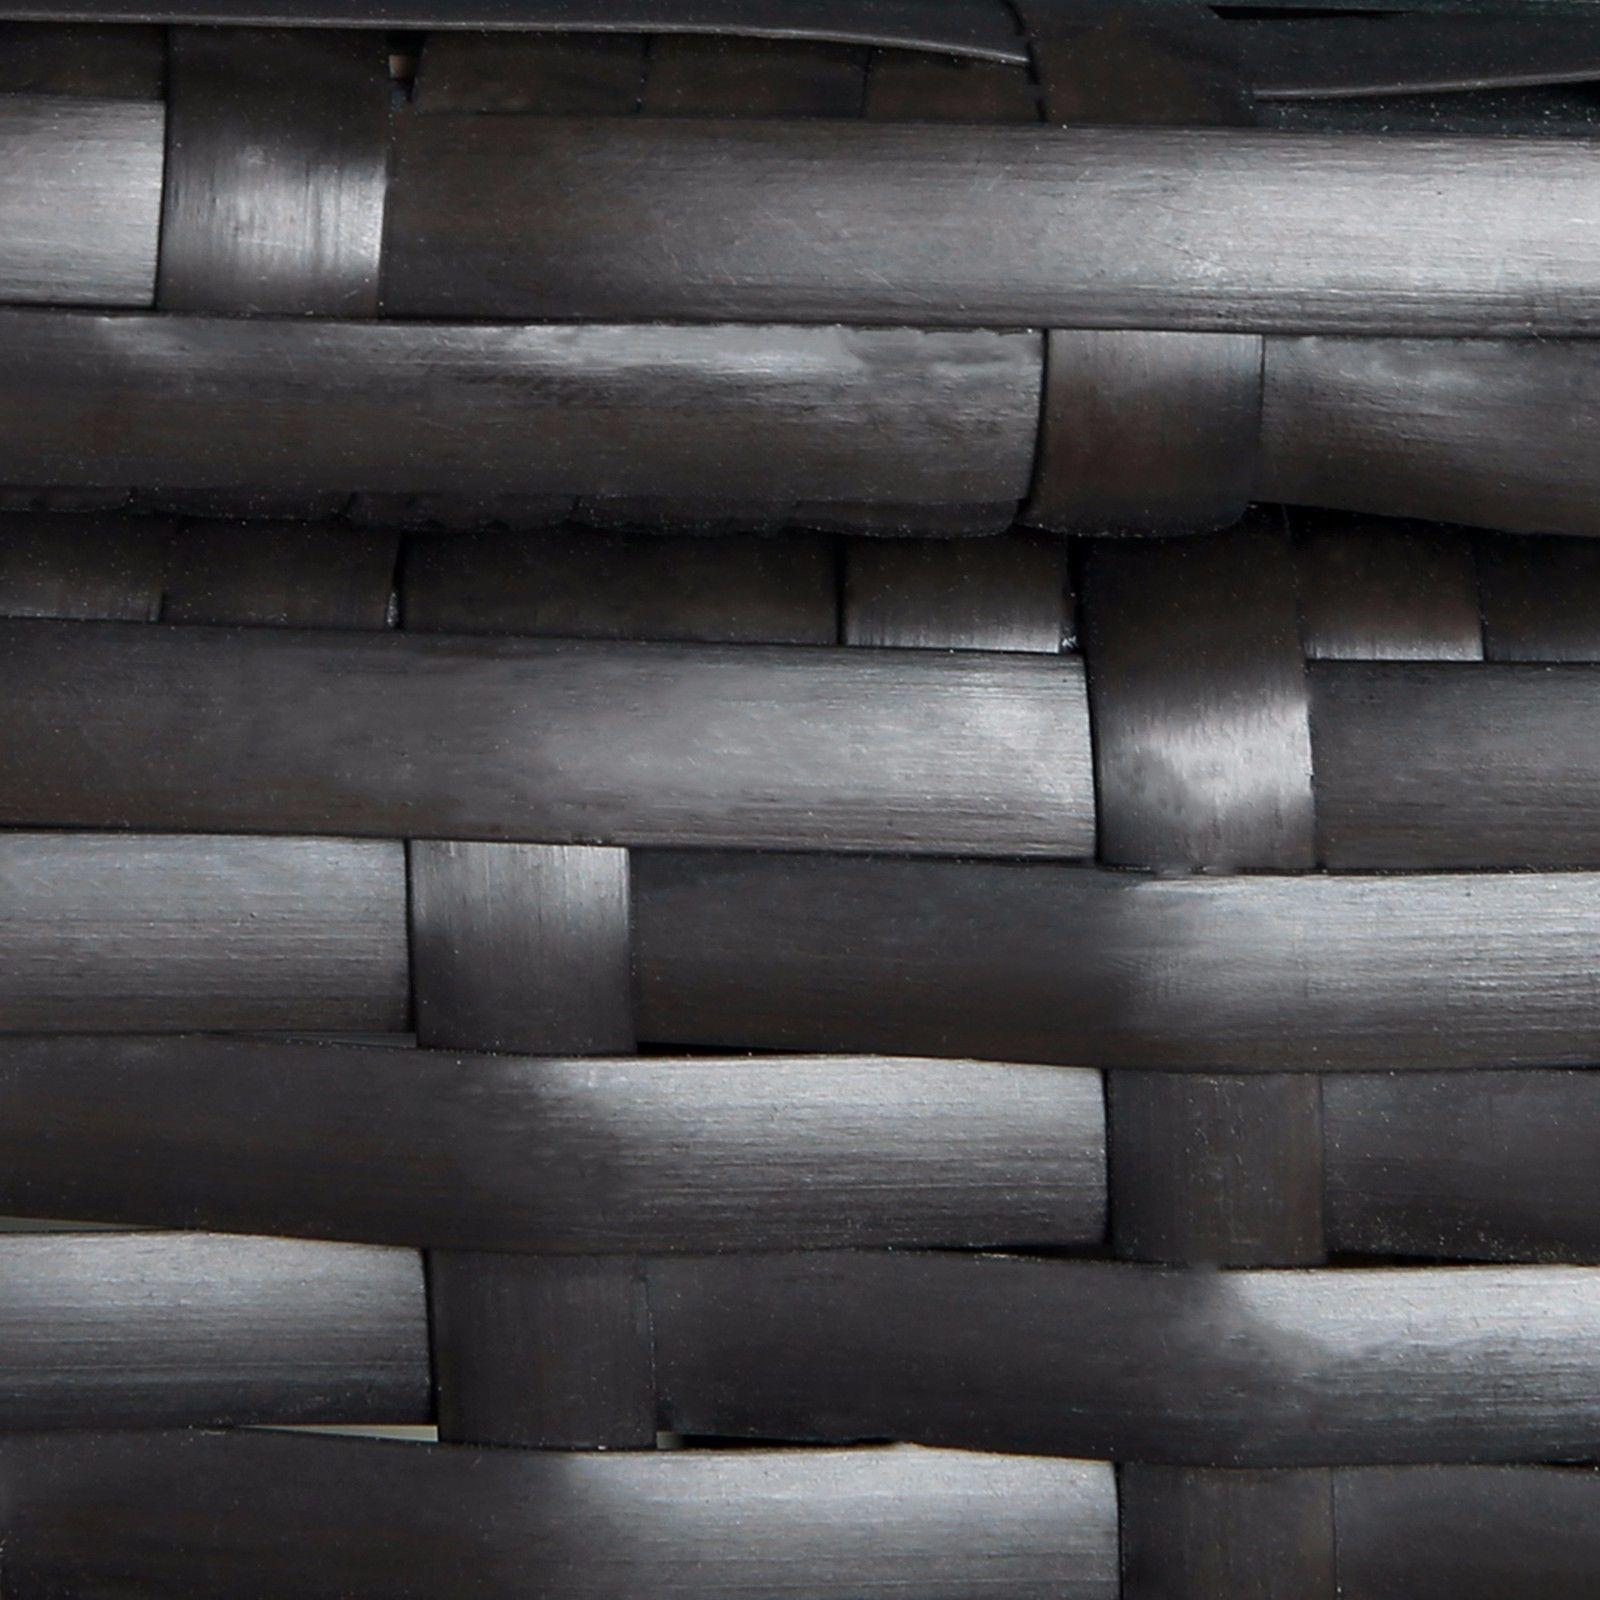 Outdoor 6 PC Rattan Wicker Patio Furniture Set Garden Sectional Sofa Set Black